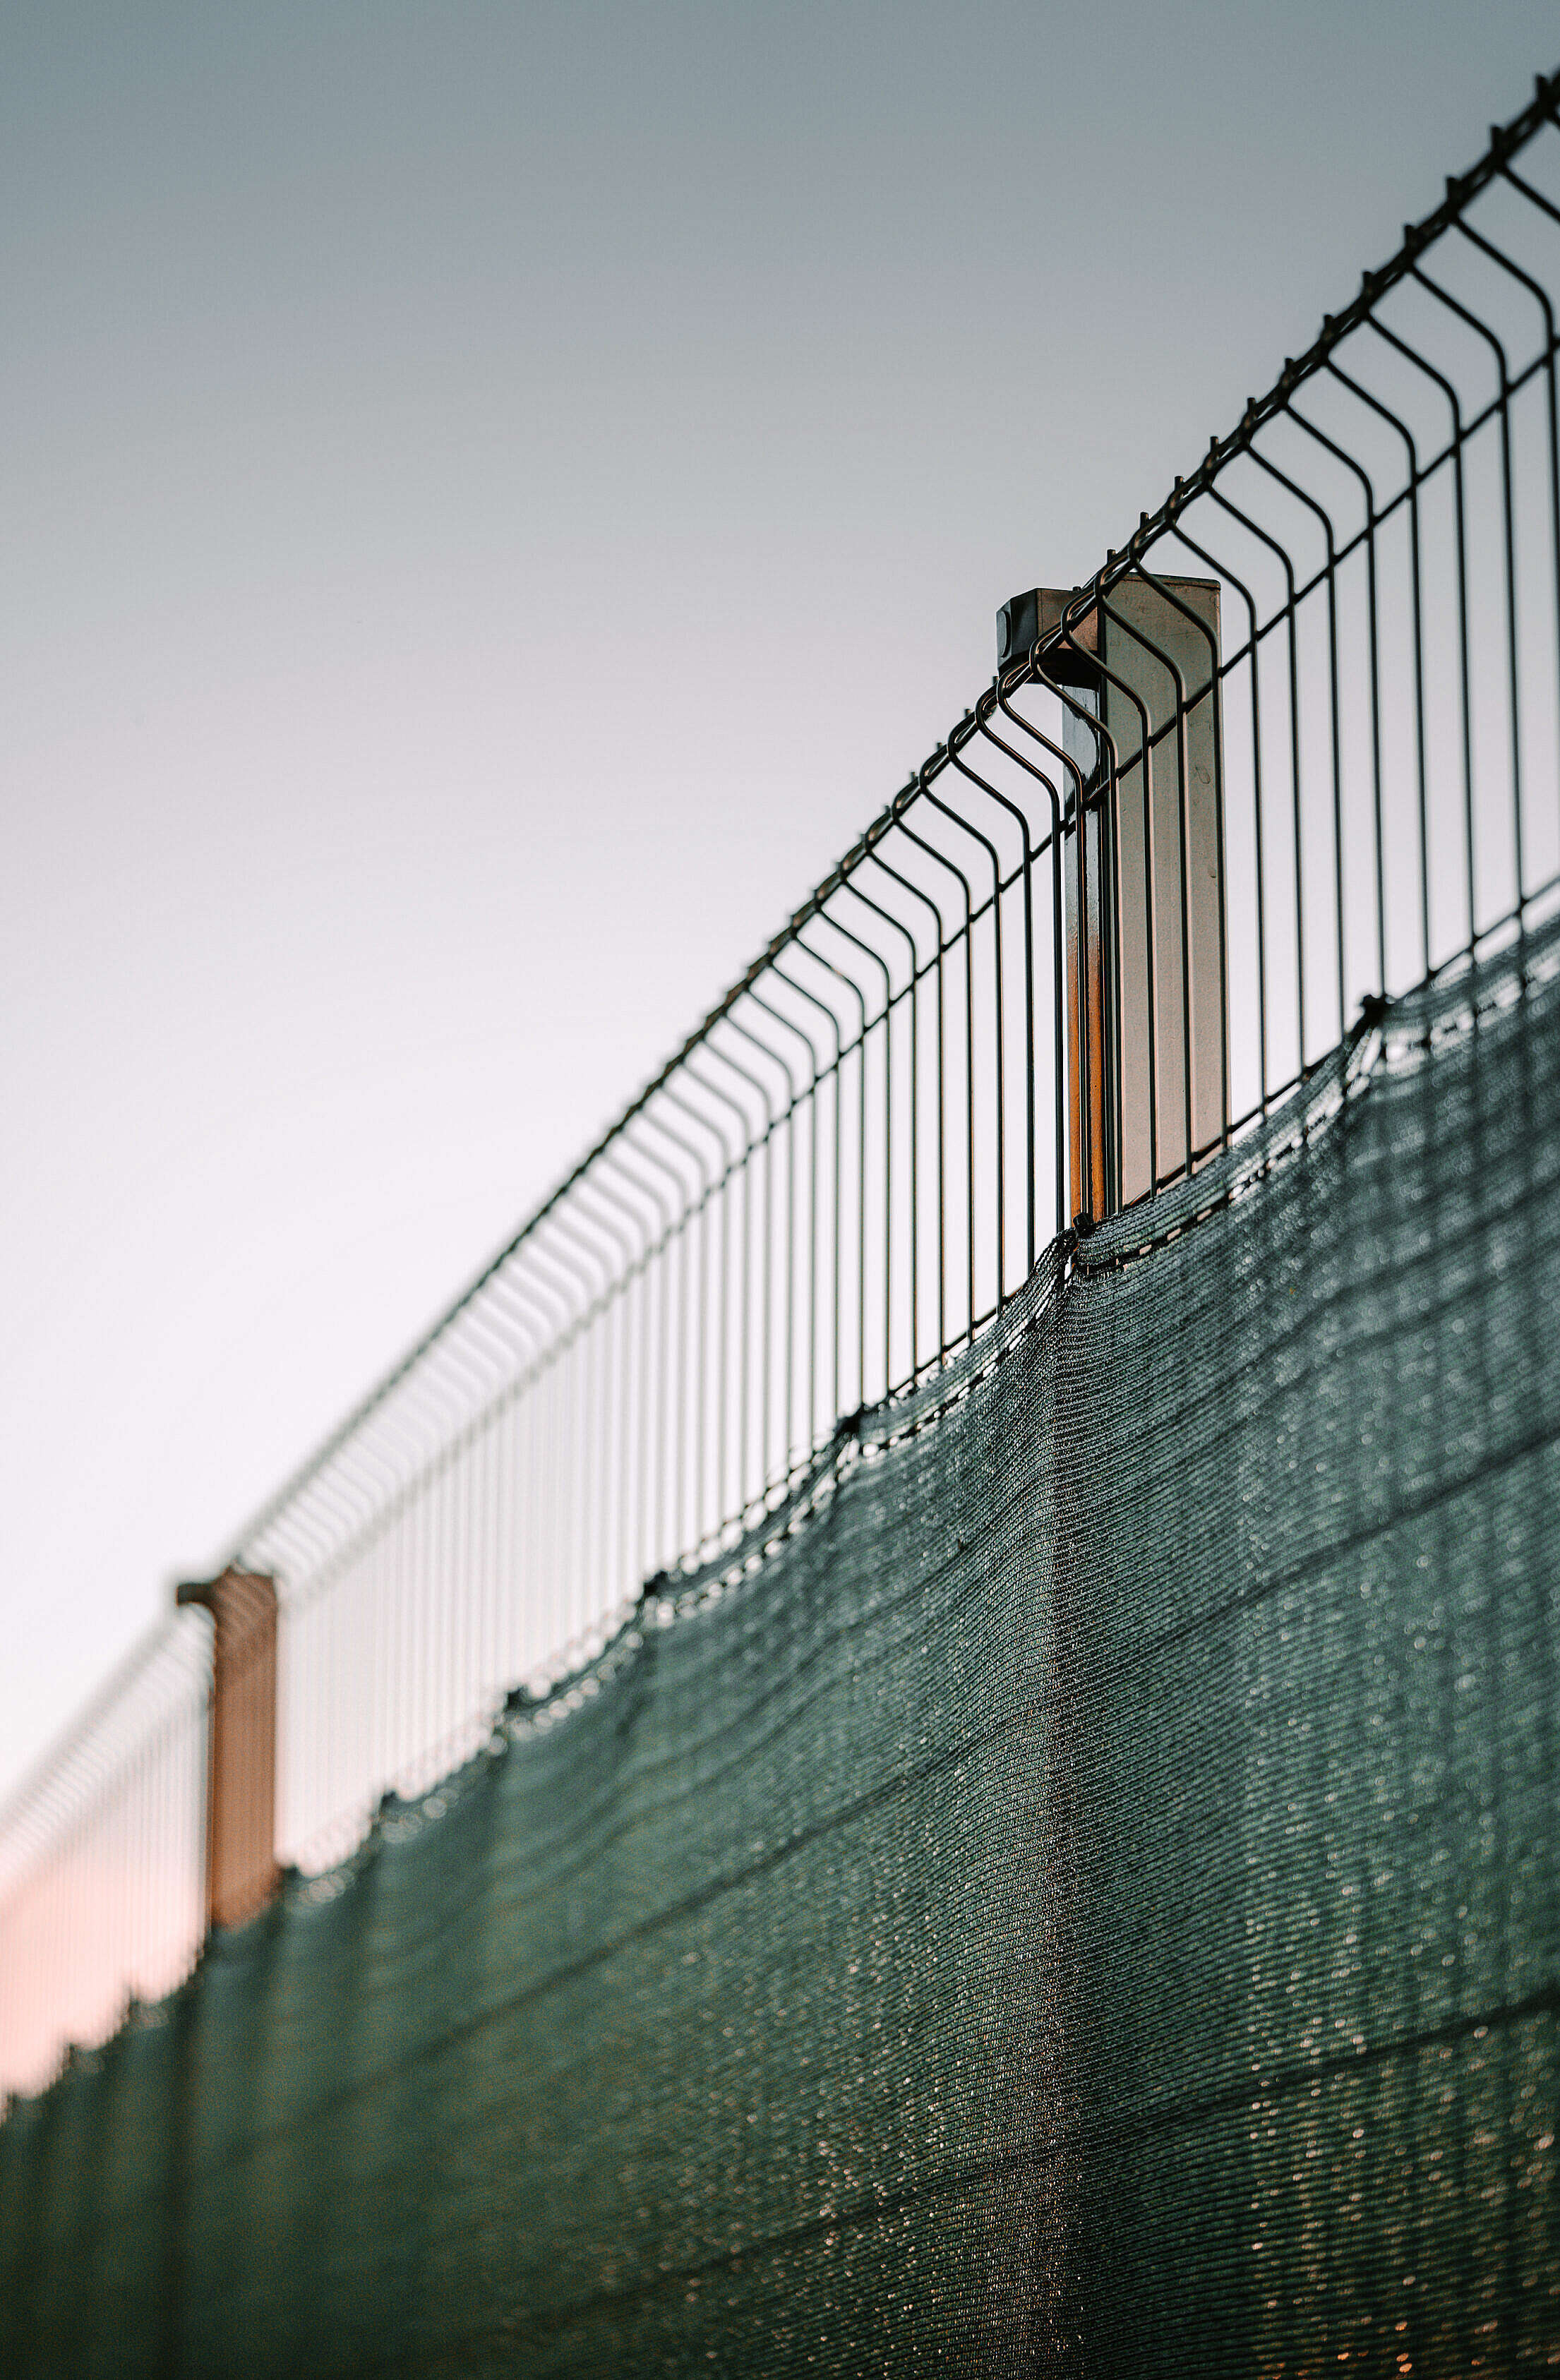 Modern Garden Metal Fence Free Stock Photo